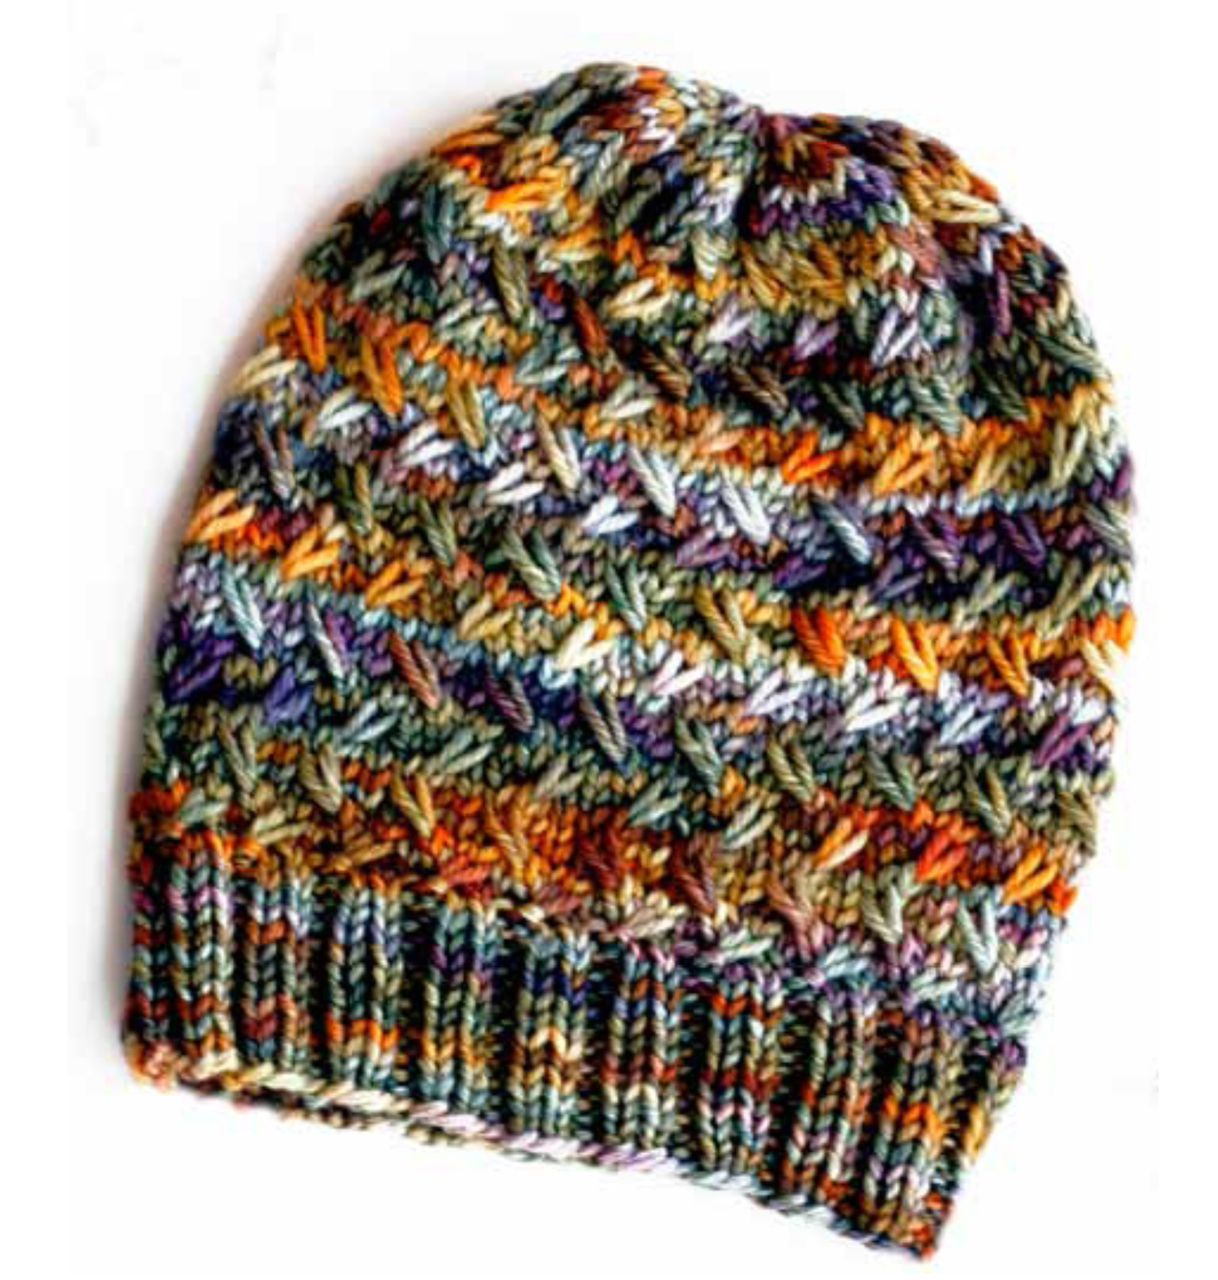 Muir woods beanie loomed loom knitting pinterest loom knitting patterns bankloansurffo Images